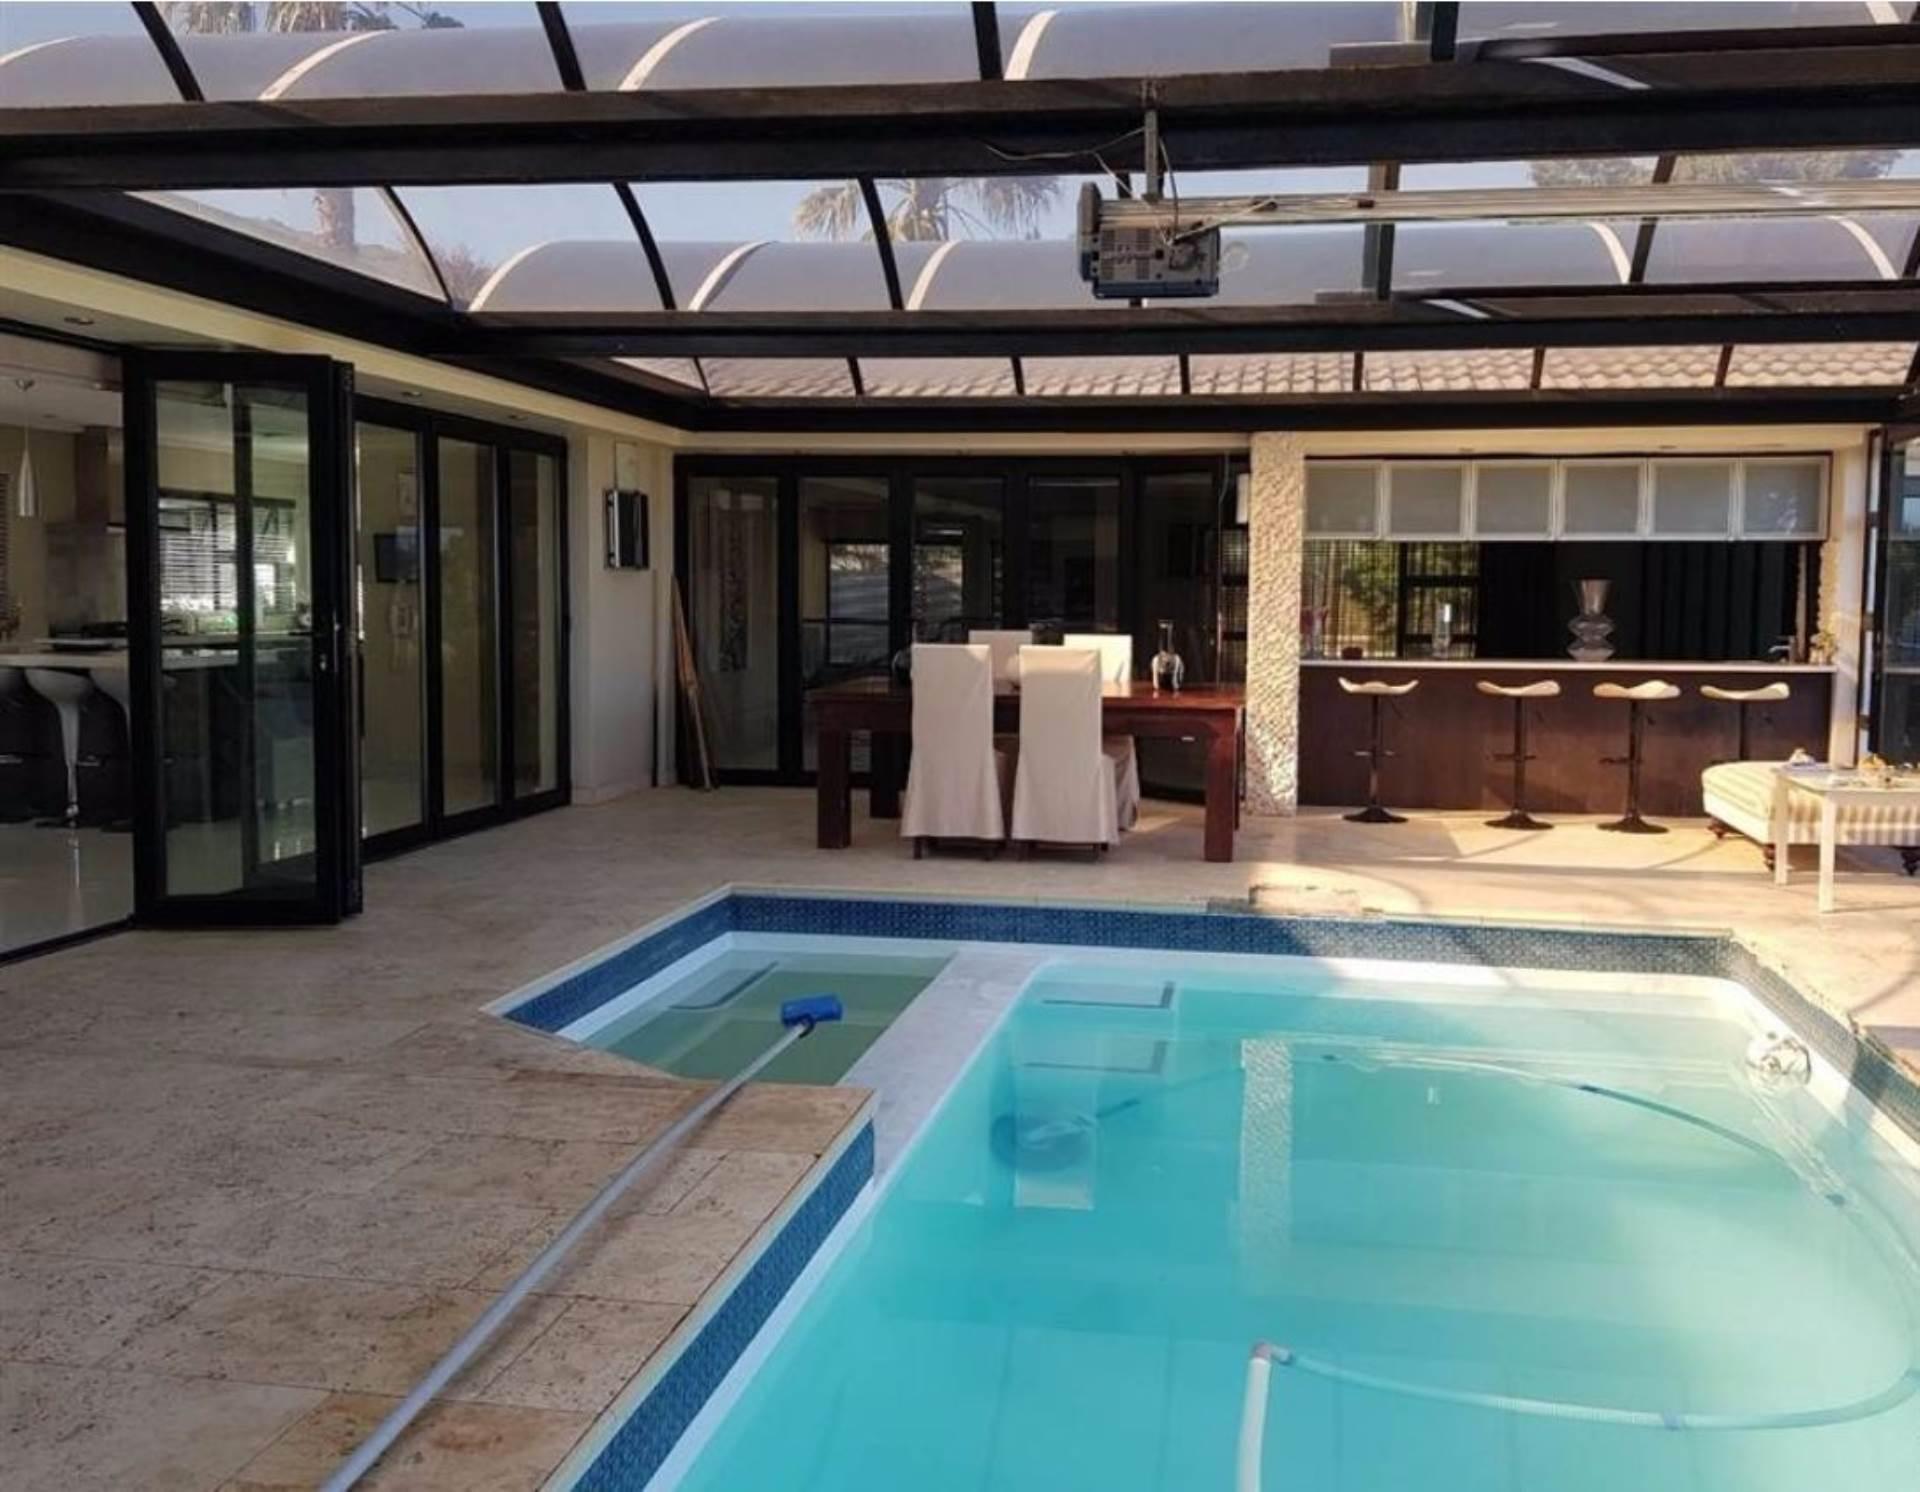 6 BedroomHouse For Sale In Plattekloof